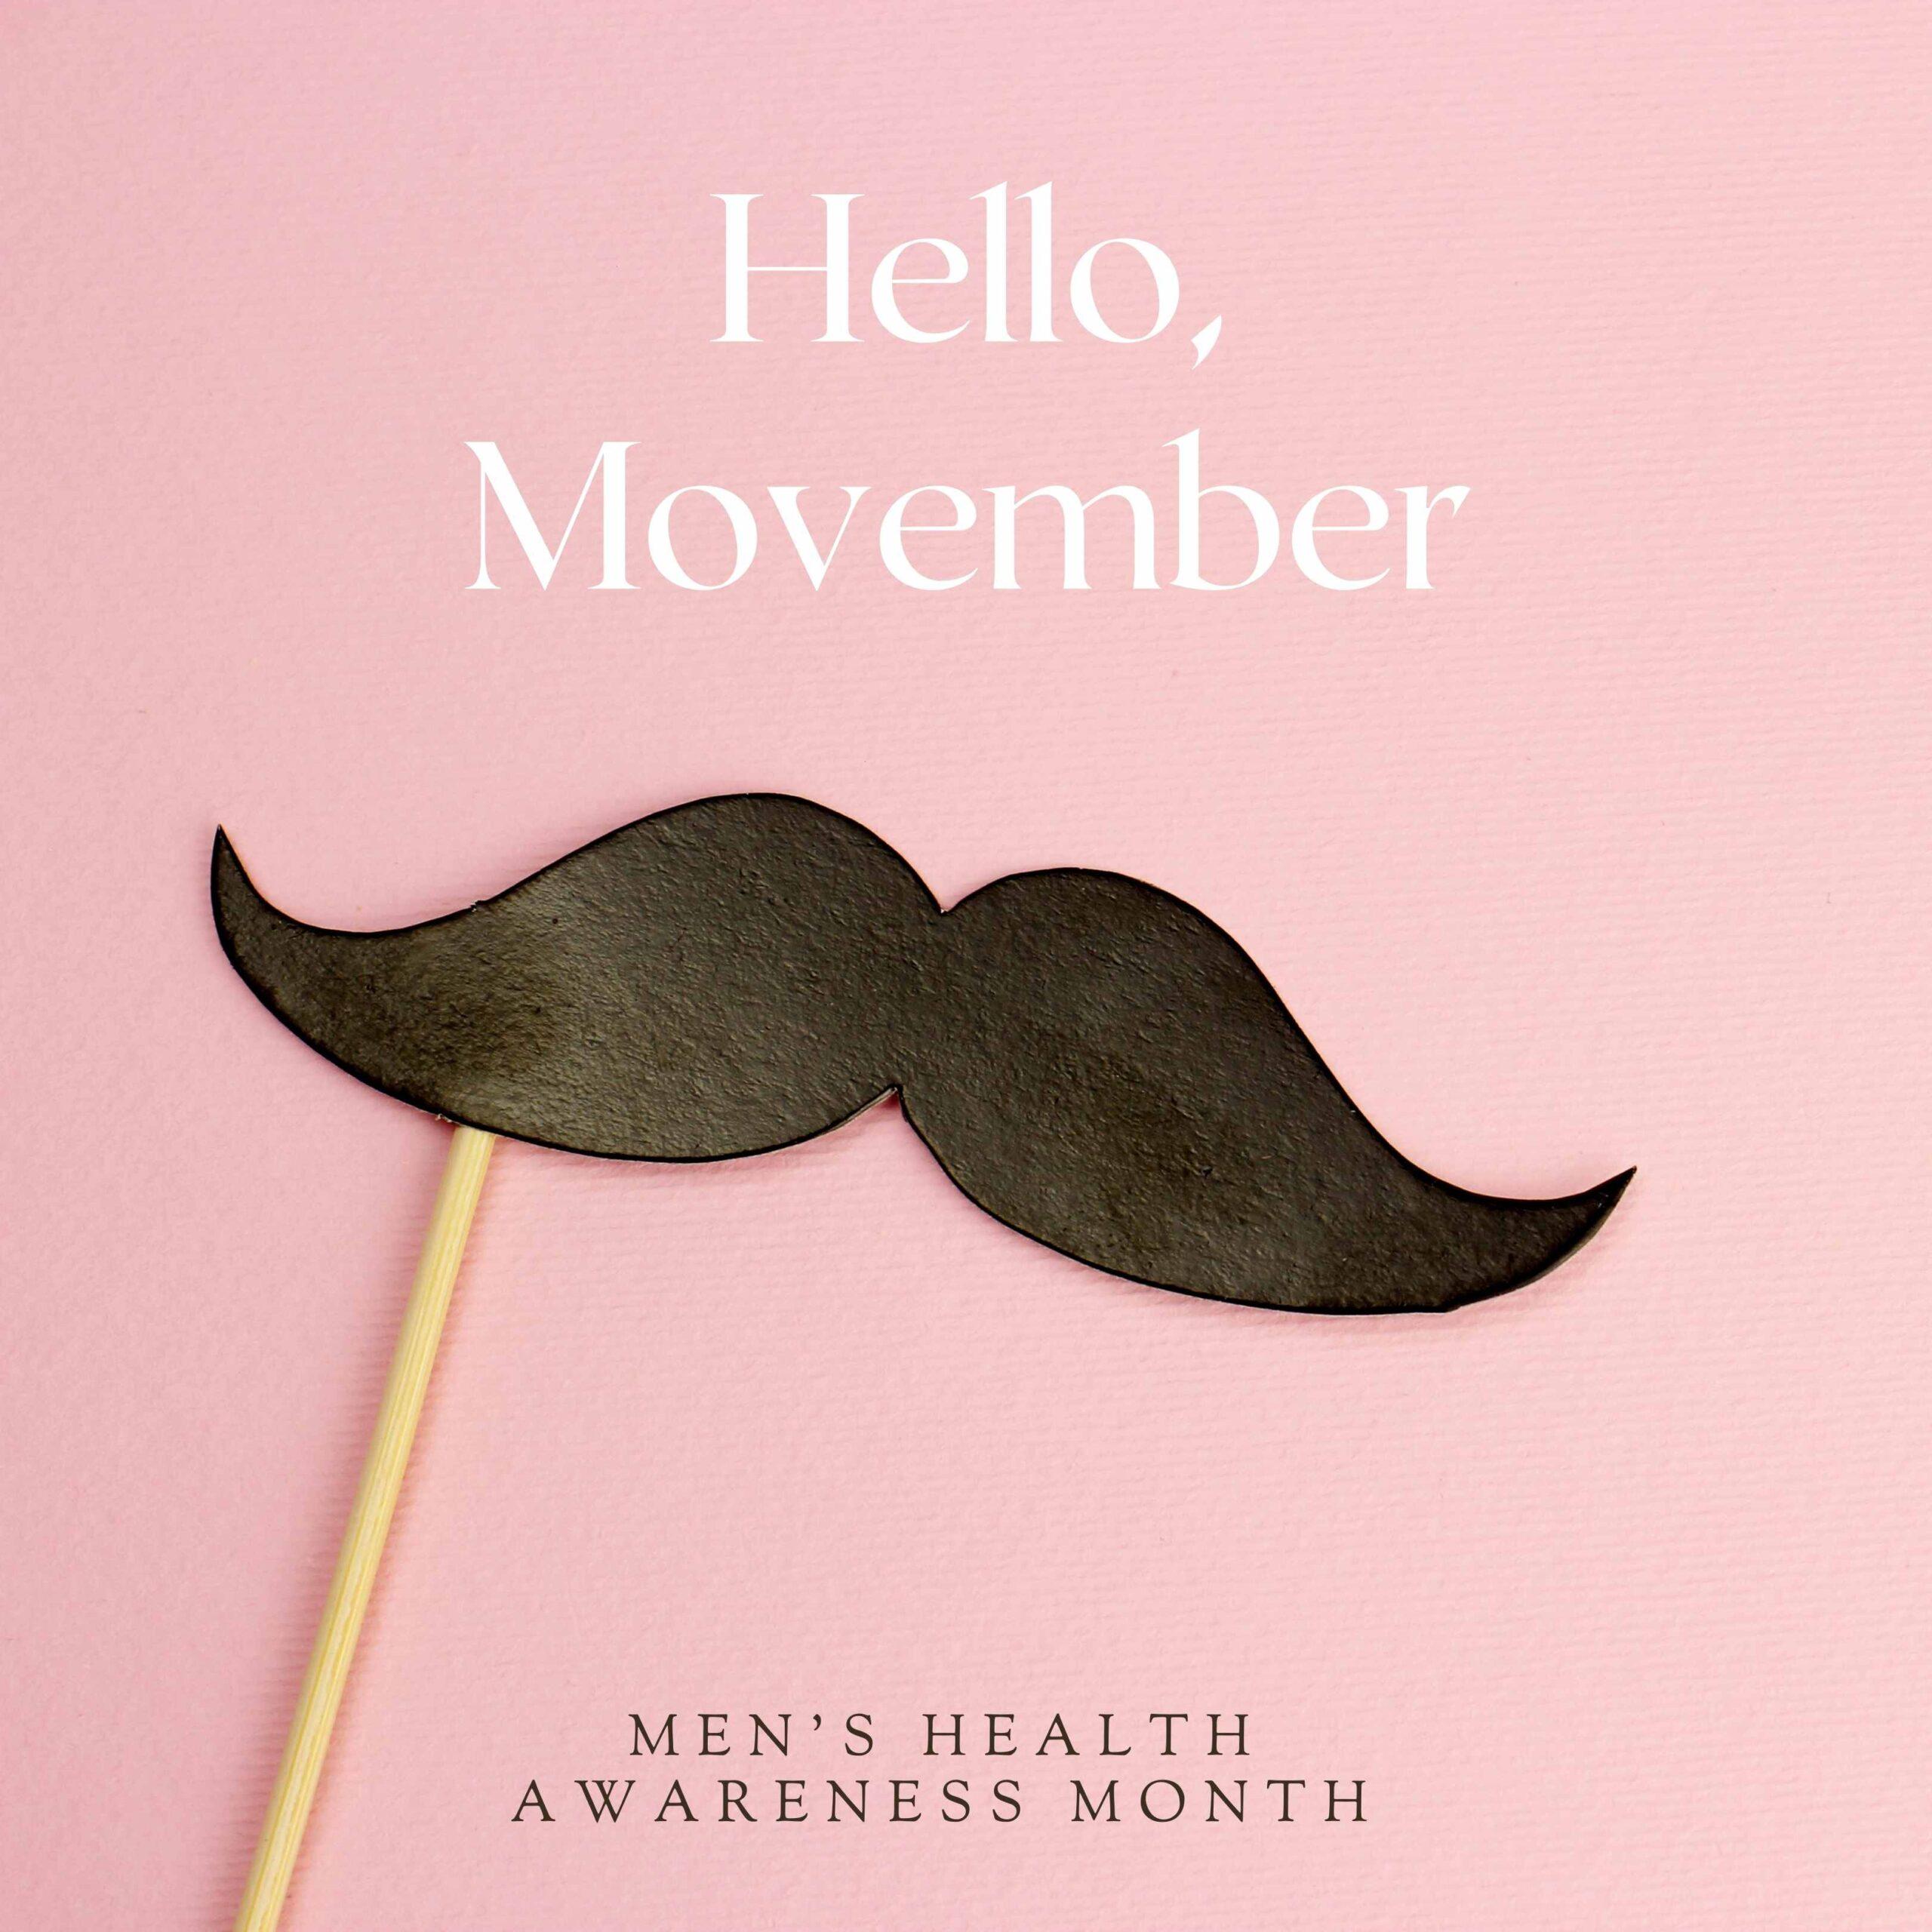 Hello, Movember